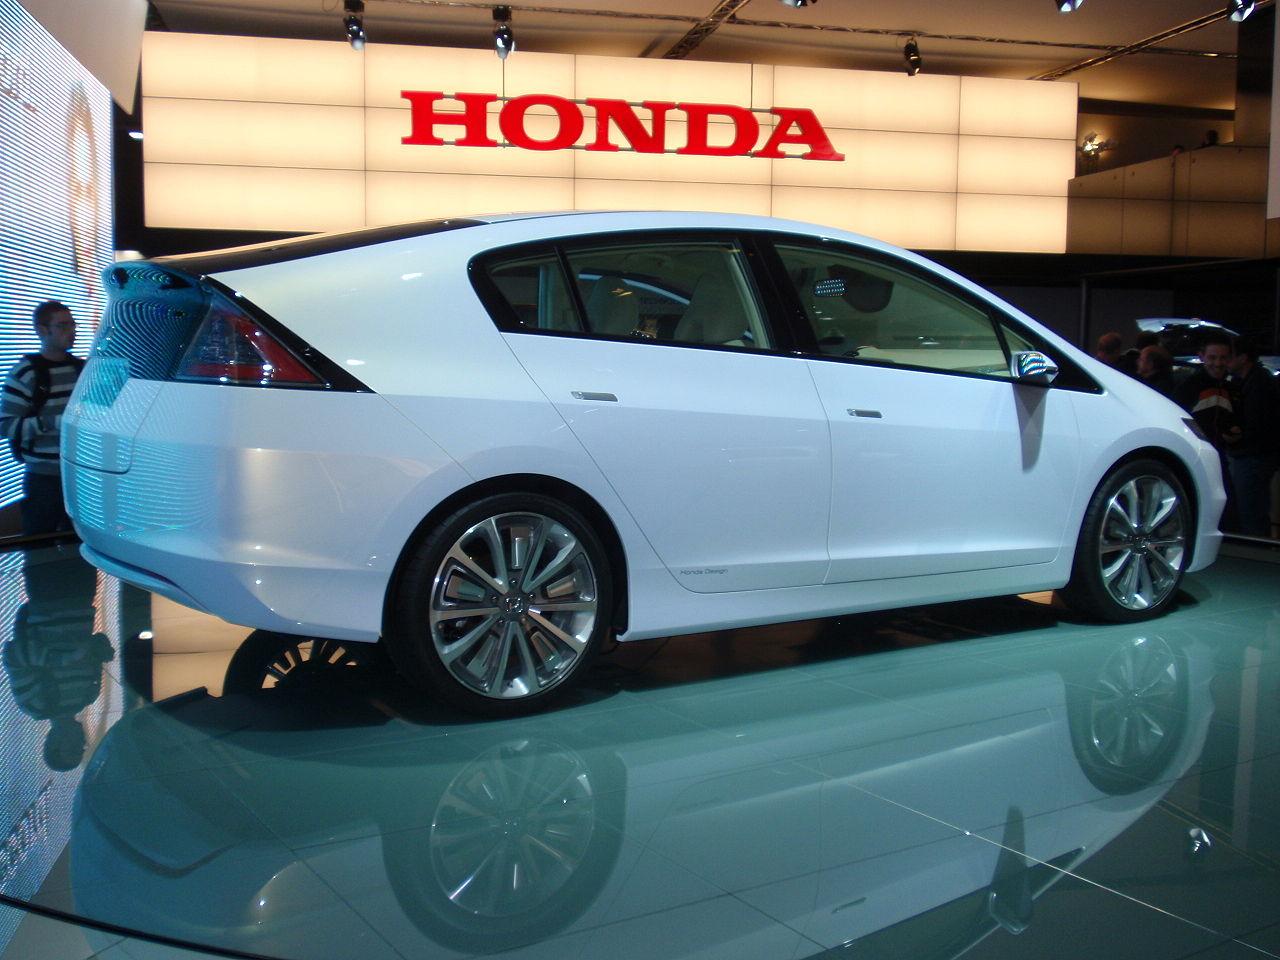 File:Honda Insight 2008 005.JPG - Wikipedia